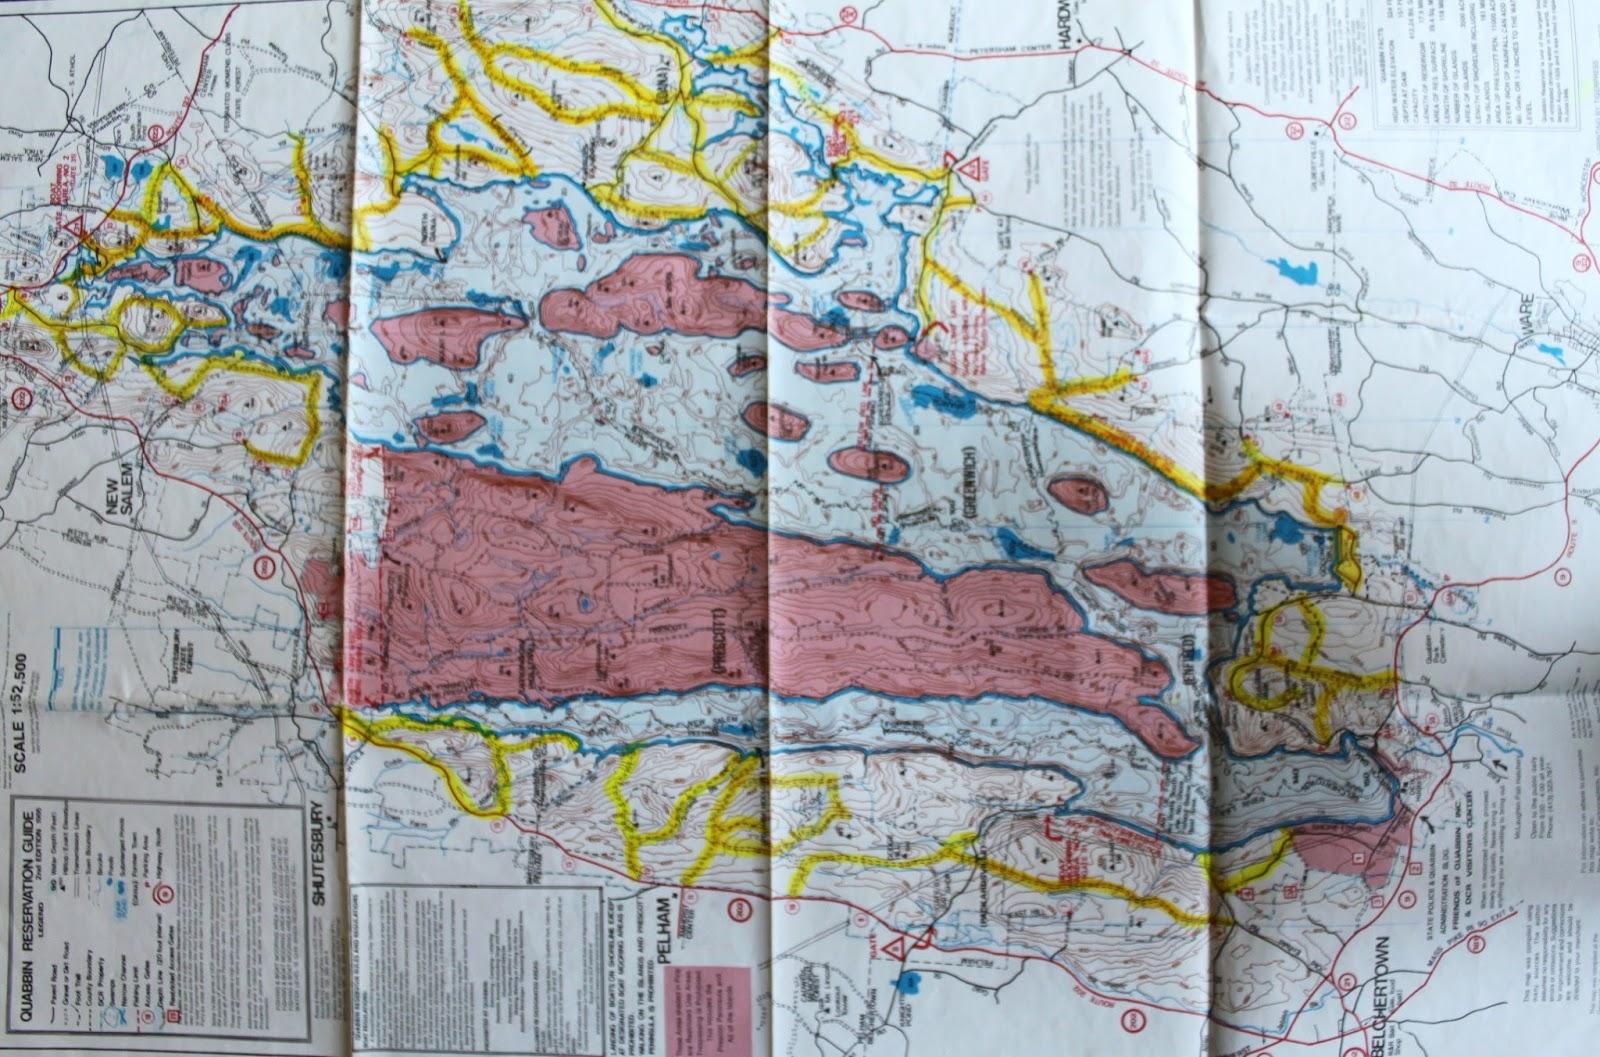 Quabbin Reservoir Hiking Map on